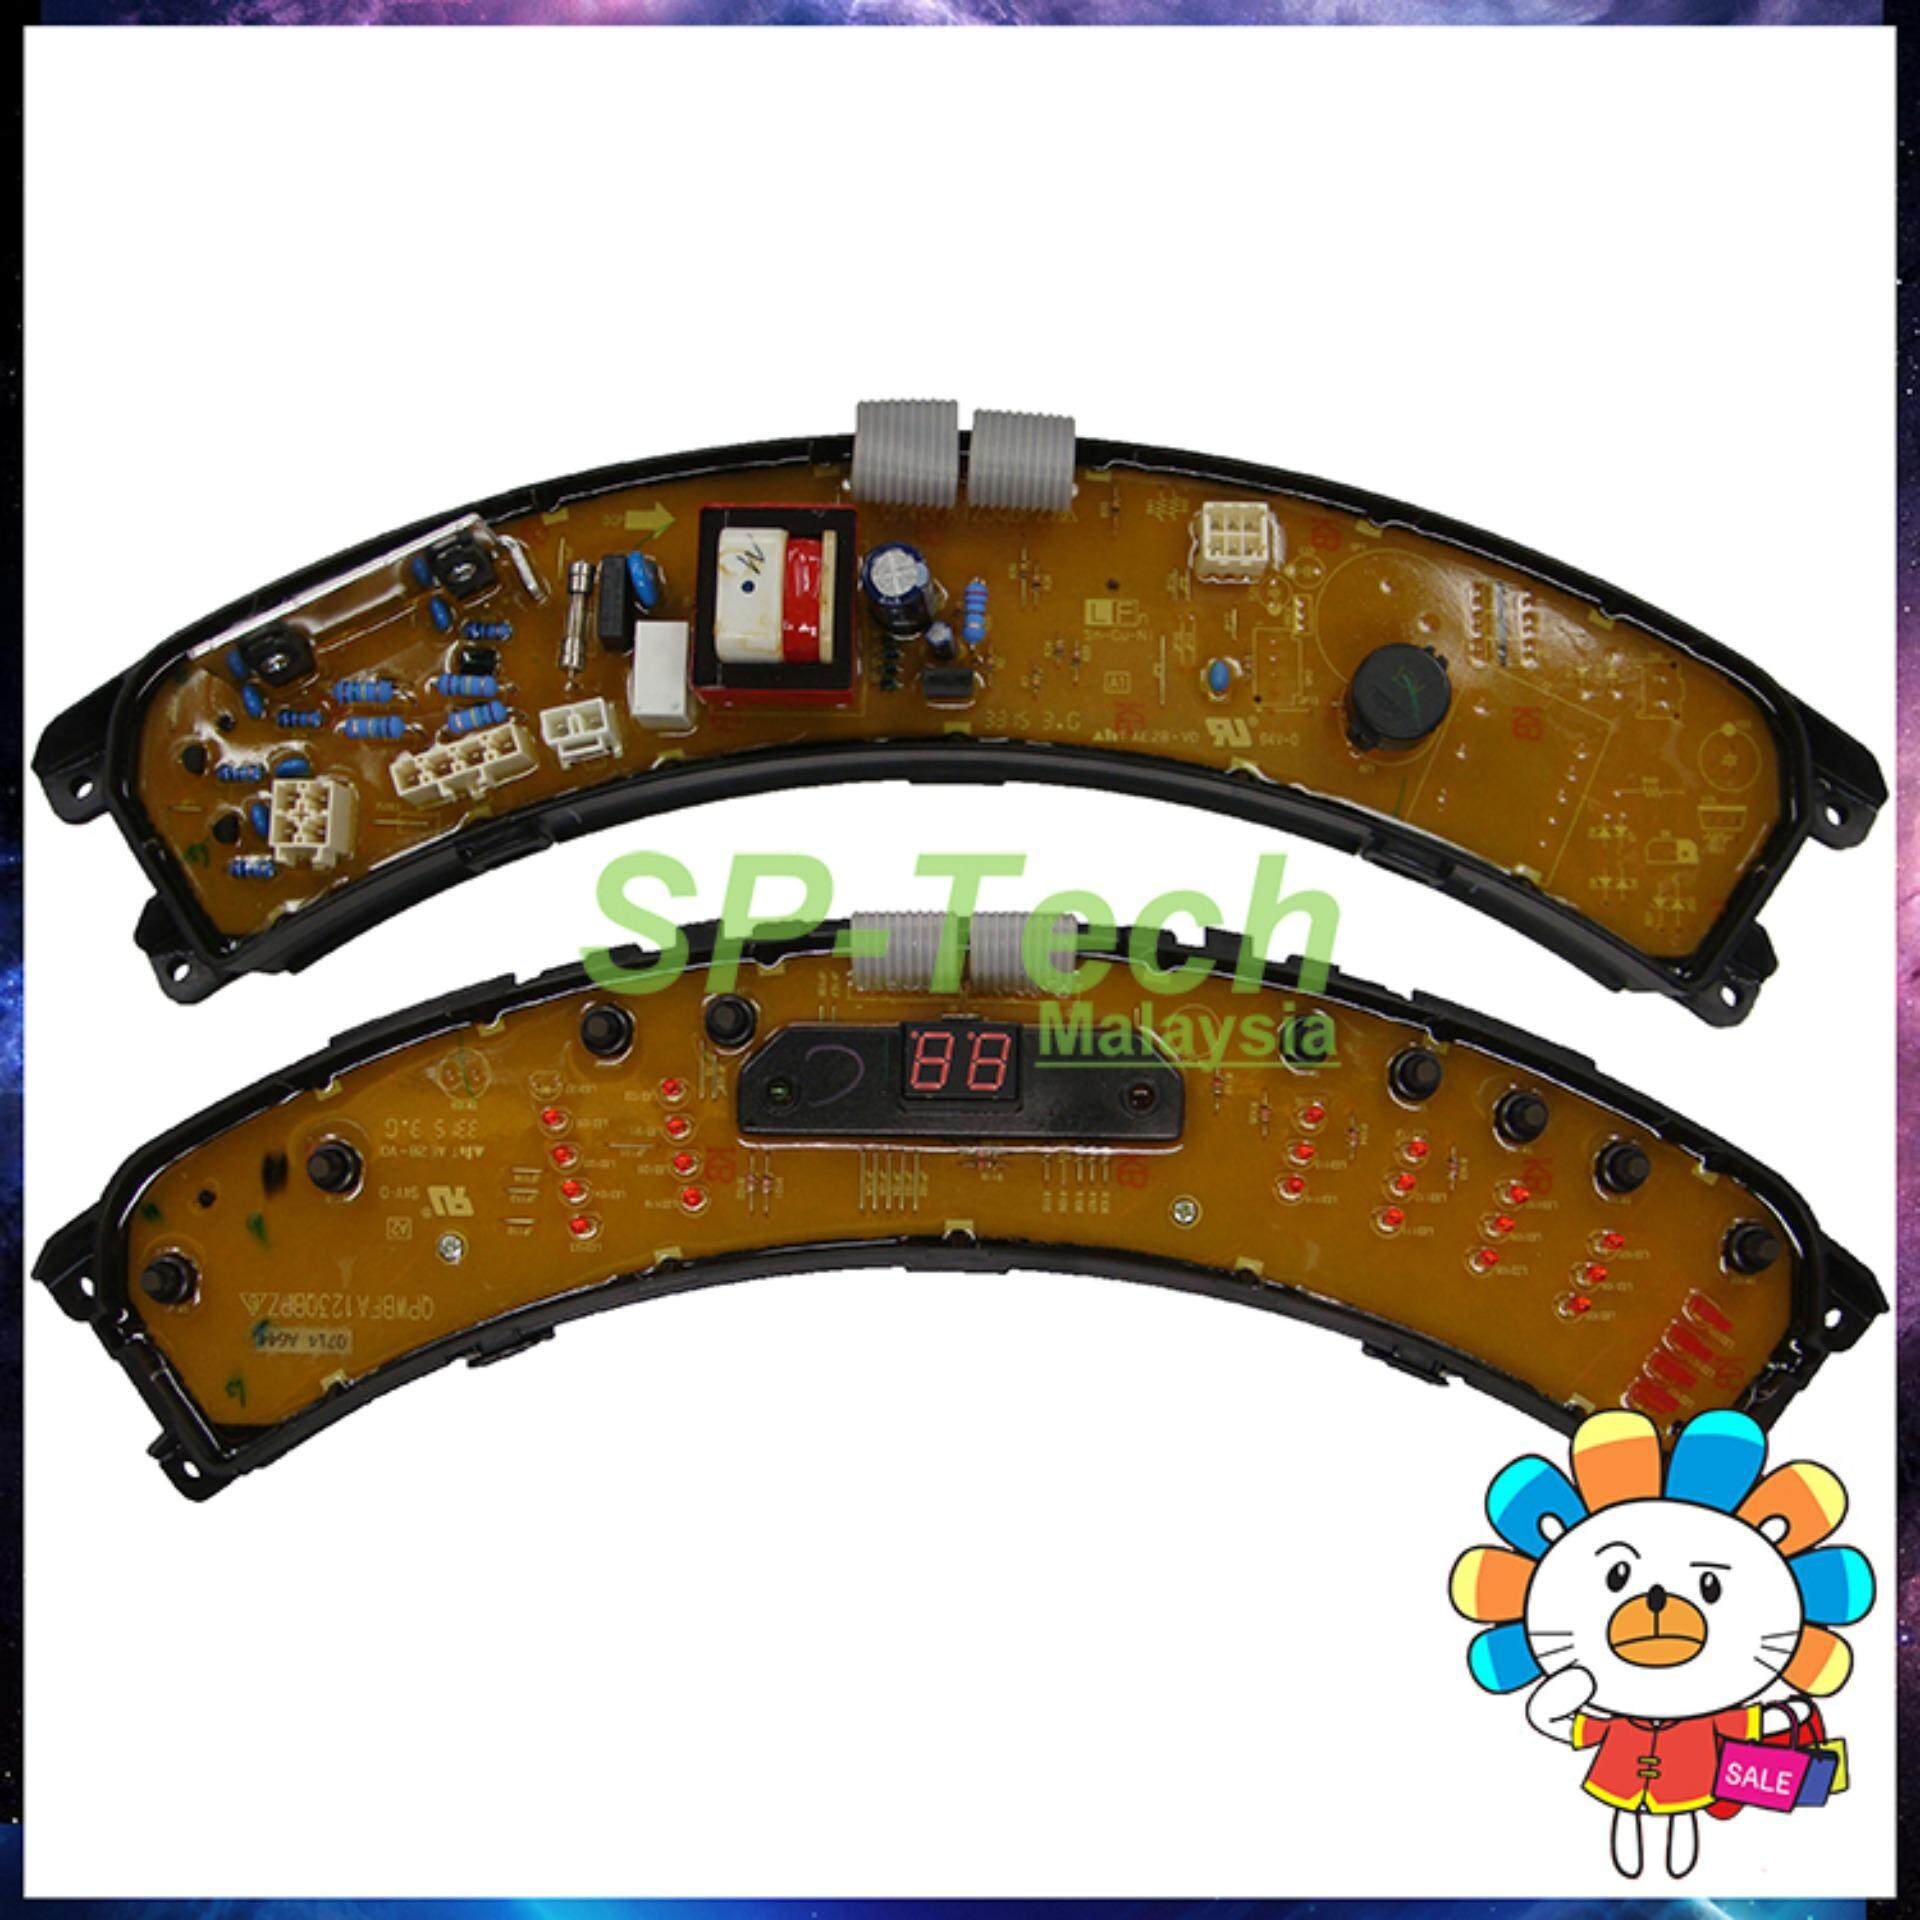 [PRE ORDER] ES-N93LM SHARP WASHING MACHINE PCB BOARD-ORIGINAL